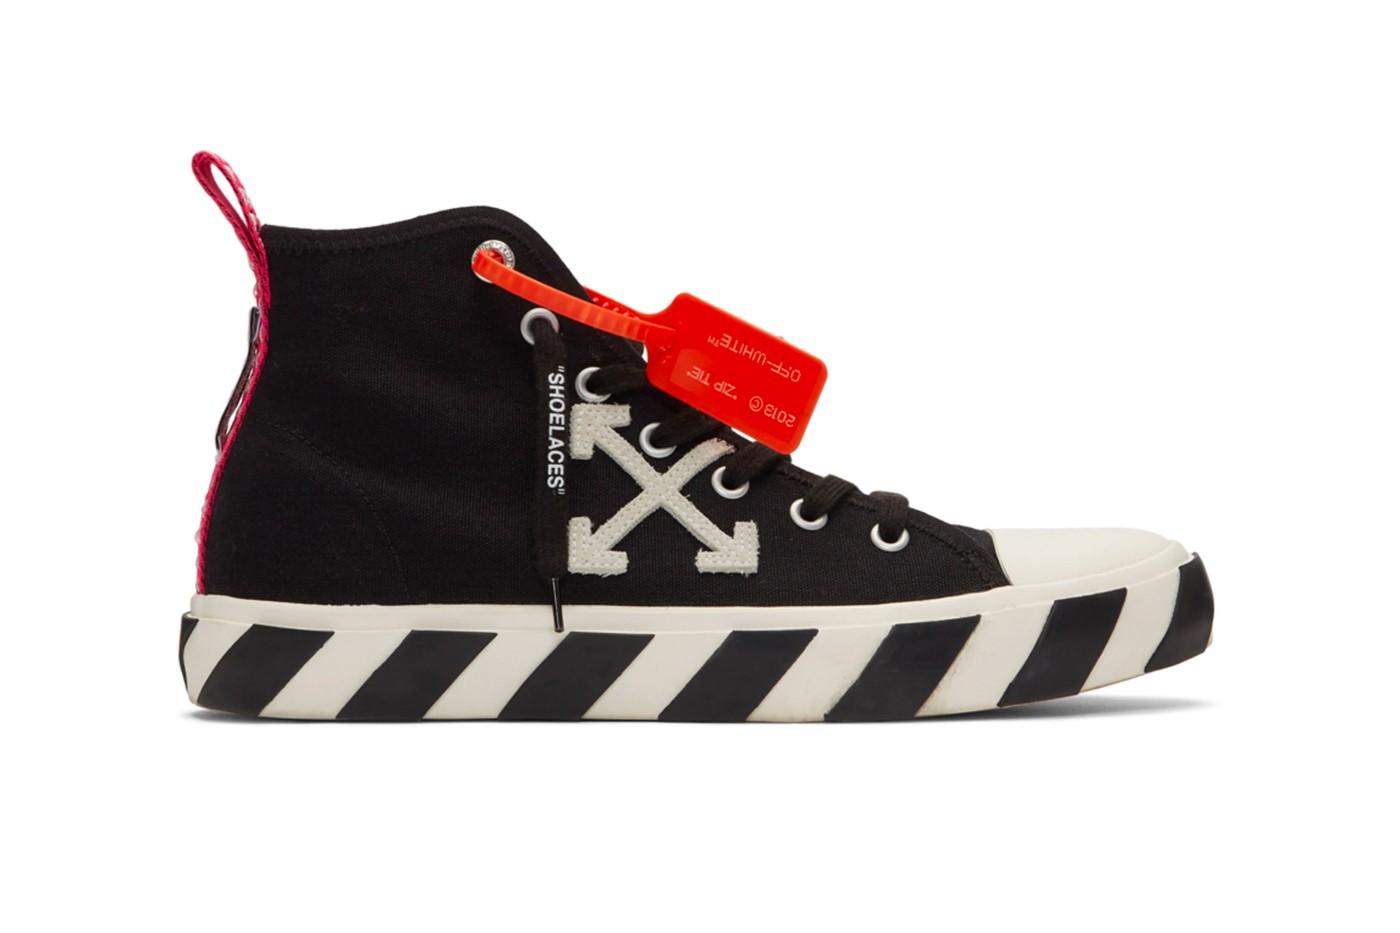 shoelaces off white, black